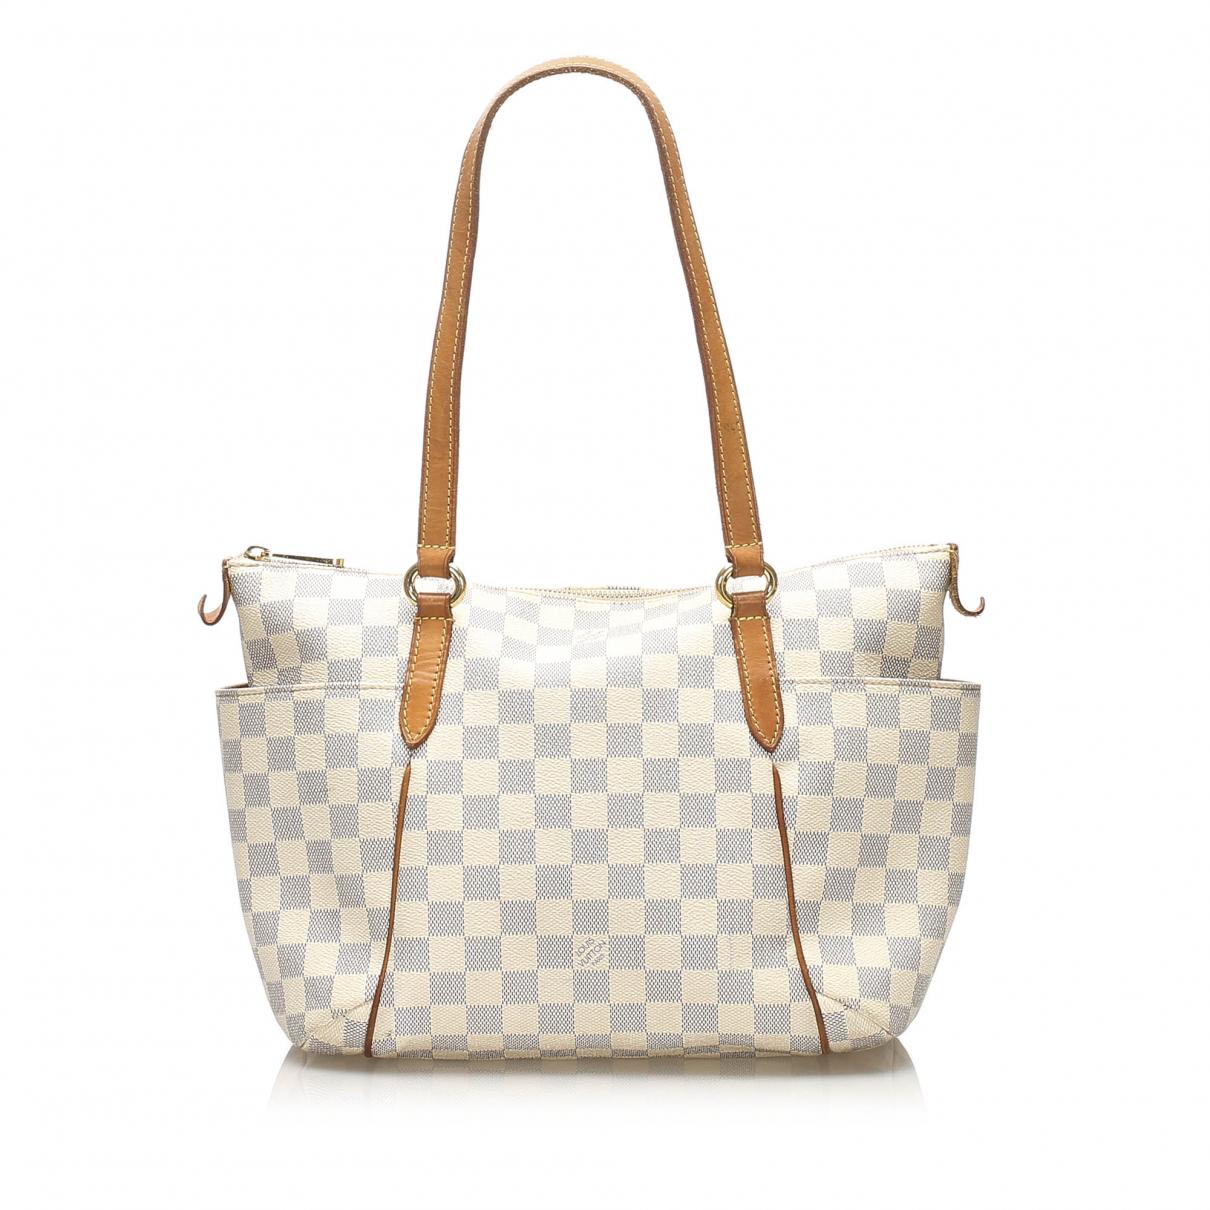 Louis Vuitton Totally Handtasche in  Weiss Leinen